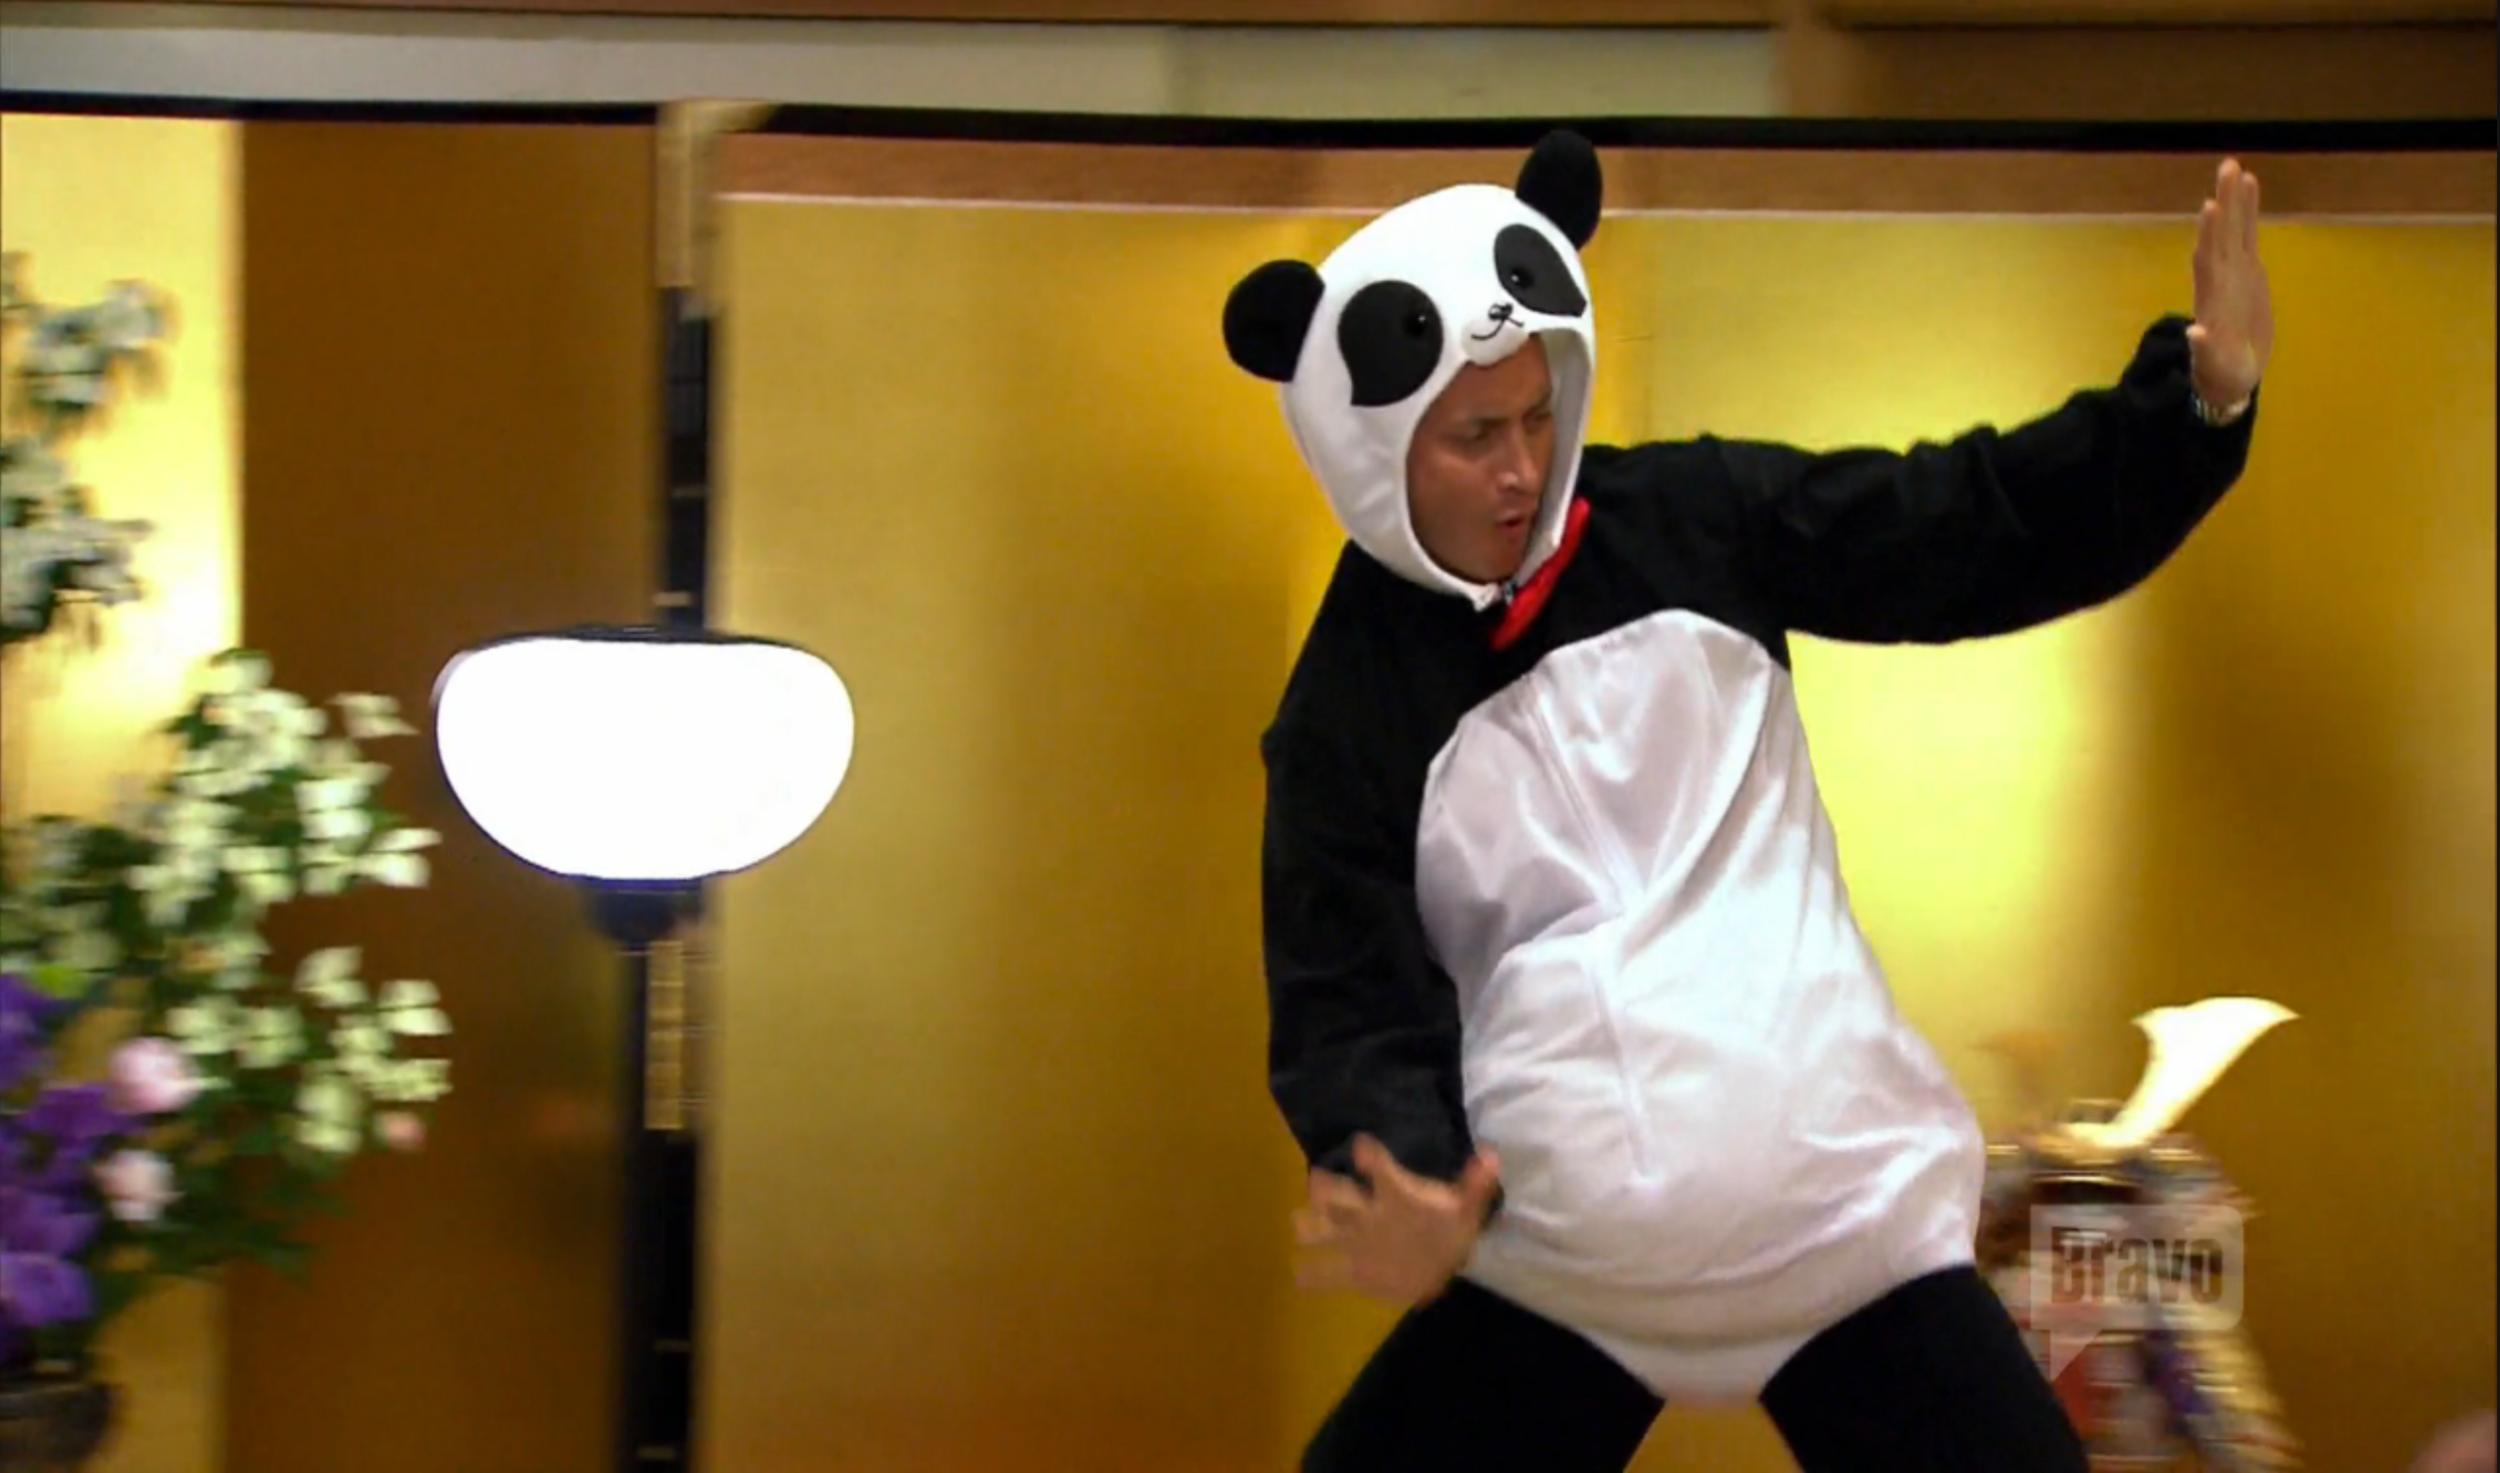 jared-levy-panda-costume